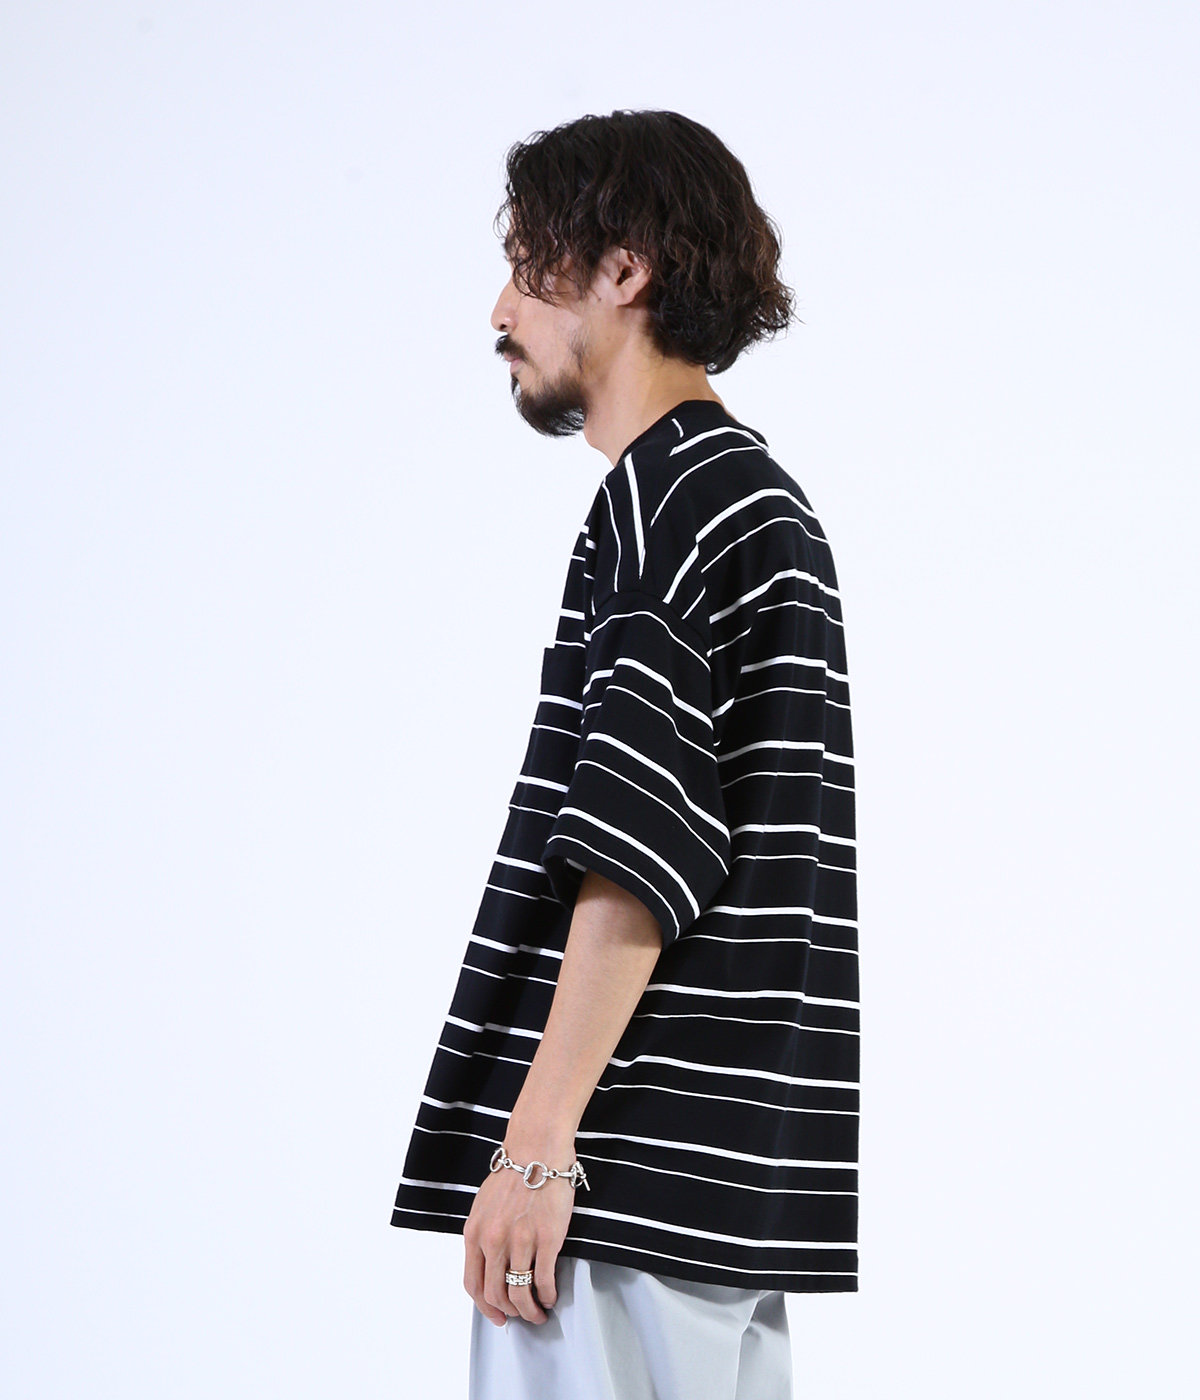 BORDER TEE S/S - 30/2 combed knit border -